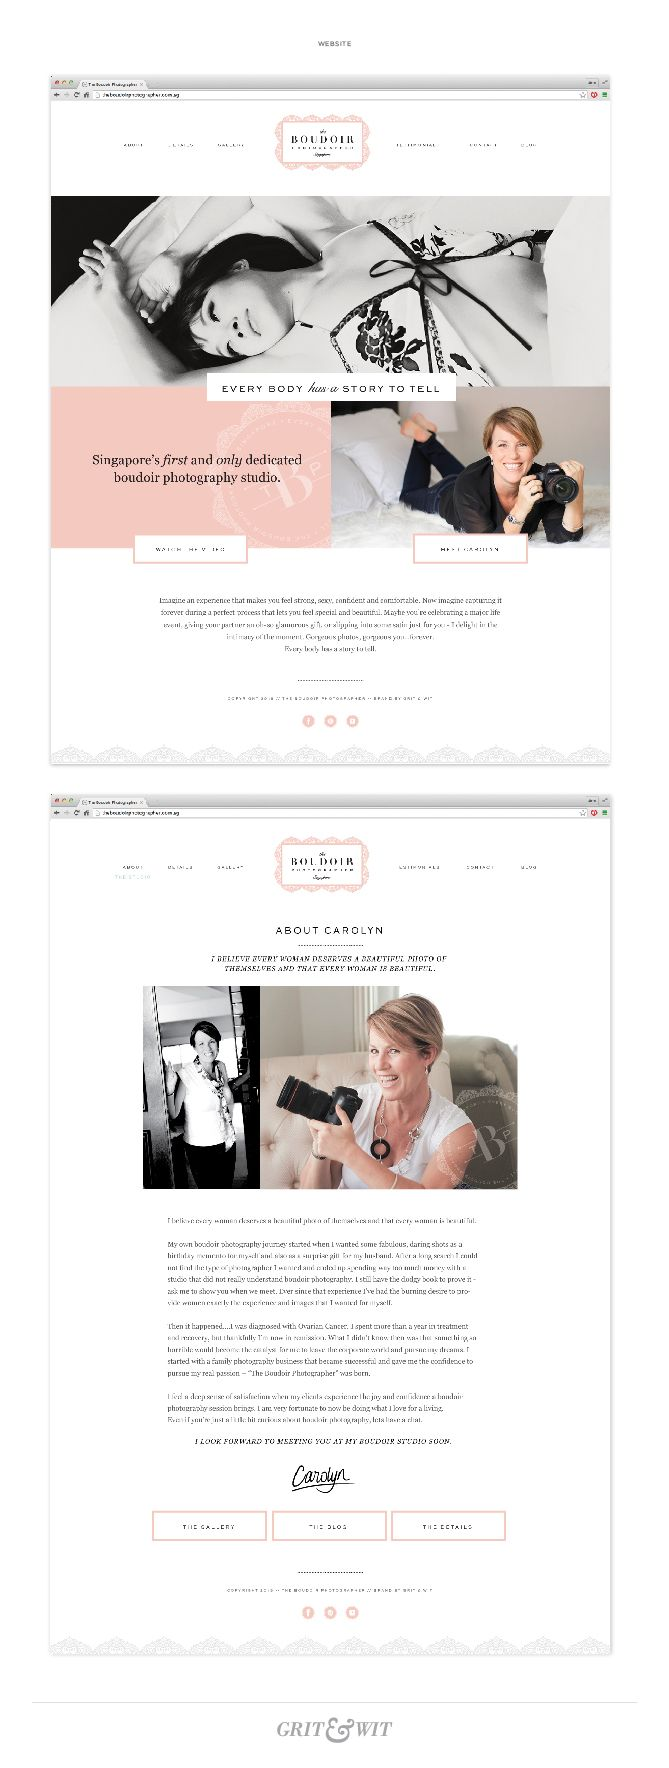 Brand Reveal // The Boudoir Photographer // #gritandwit #branding #boudoirphotographer